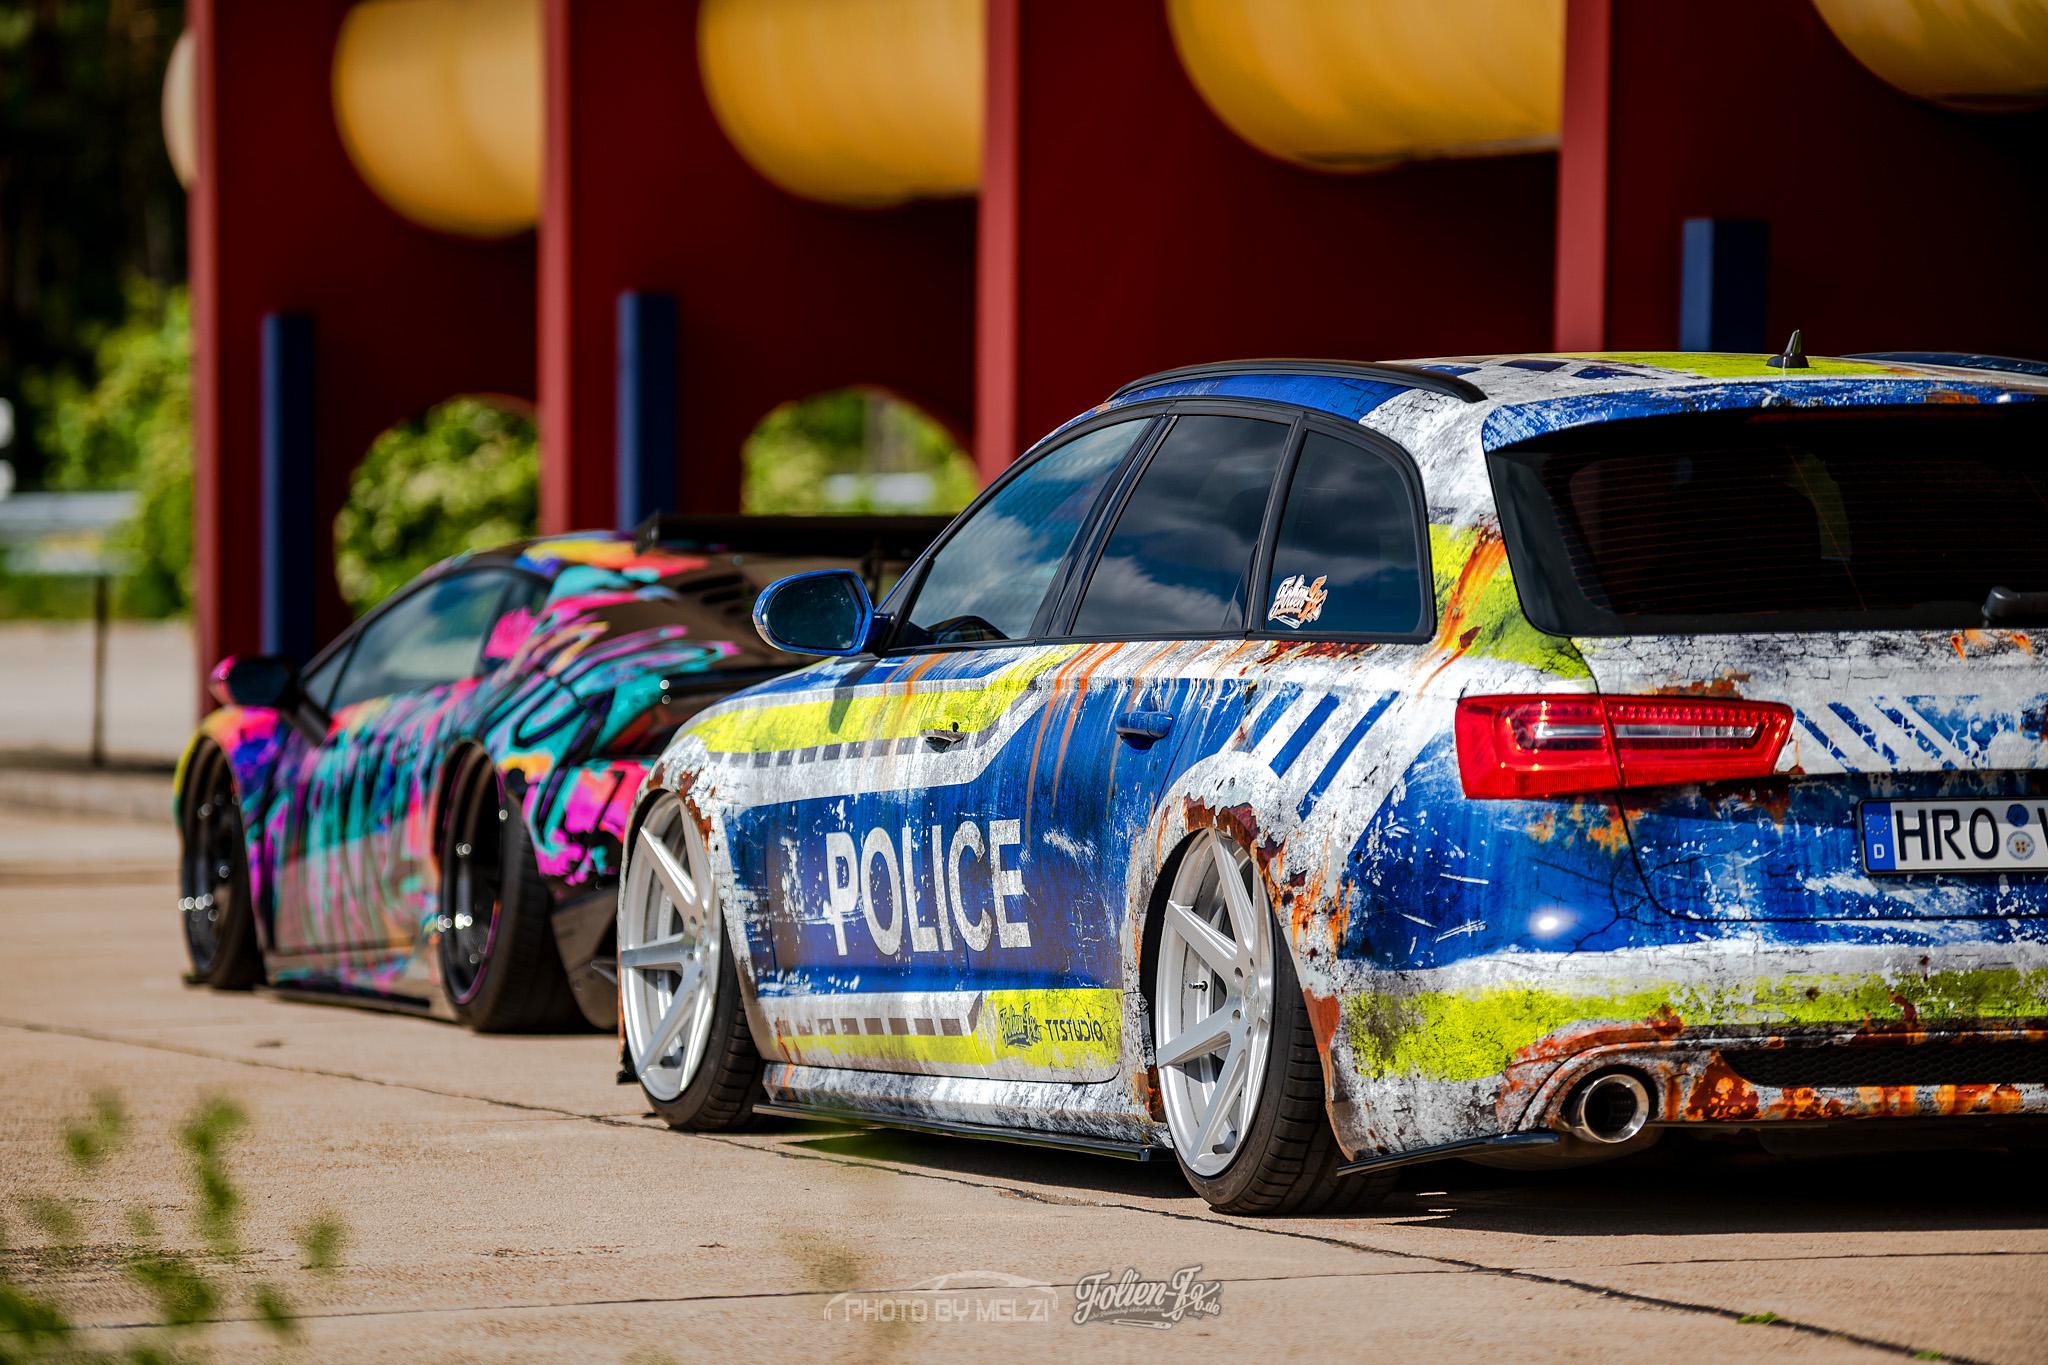 💥 Audi A6 police 💥